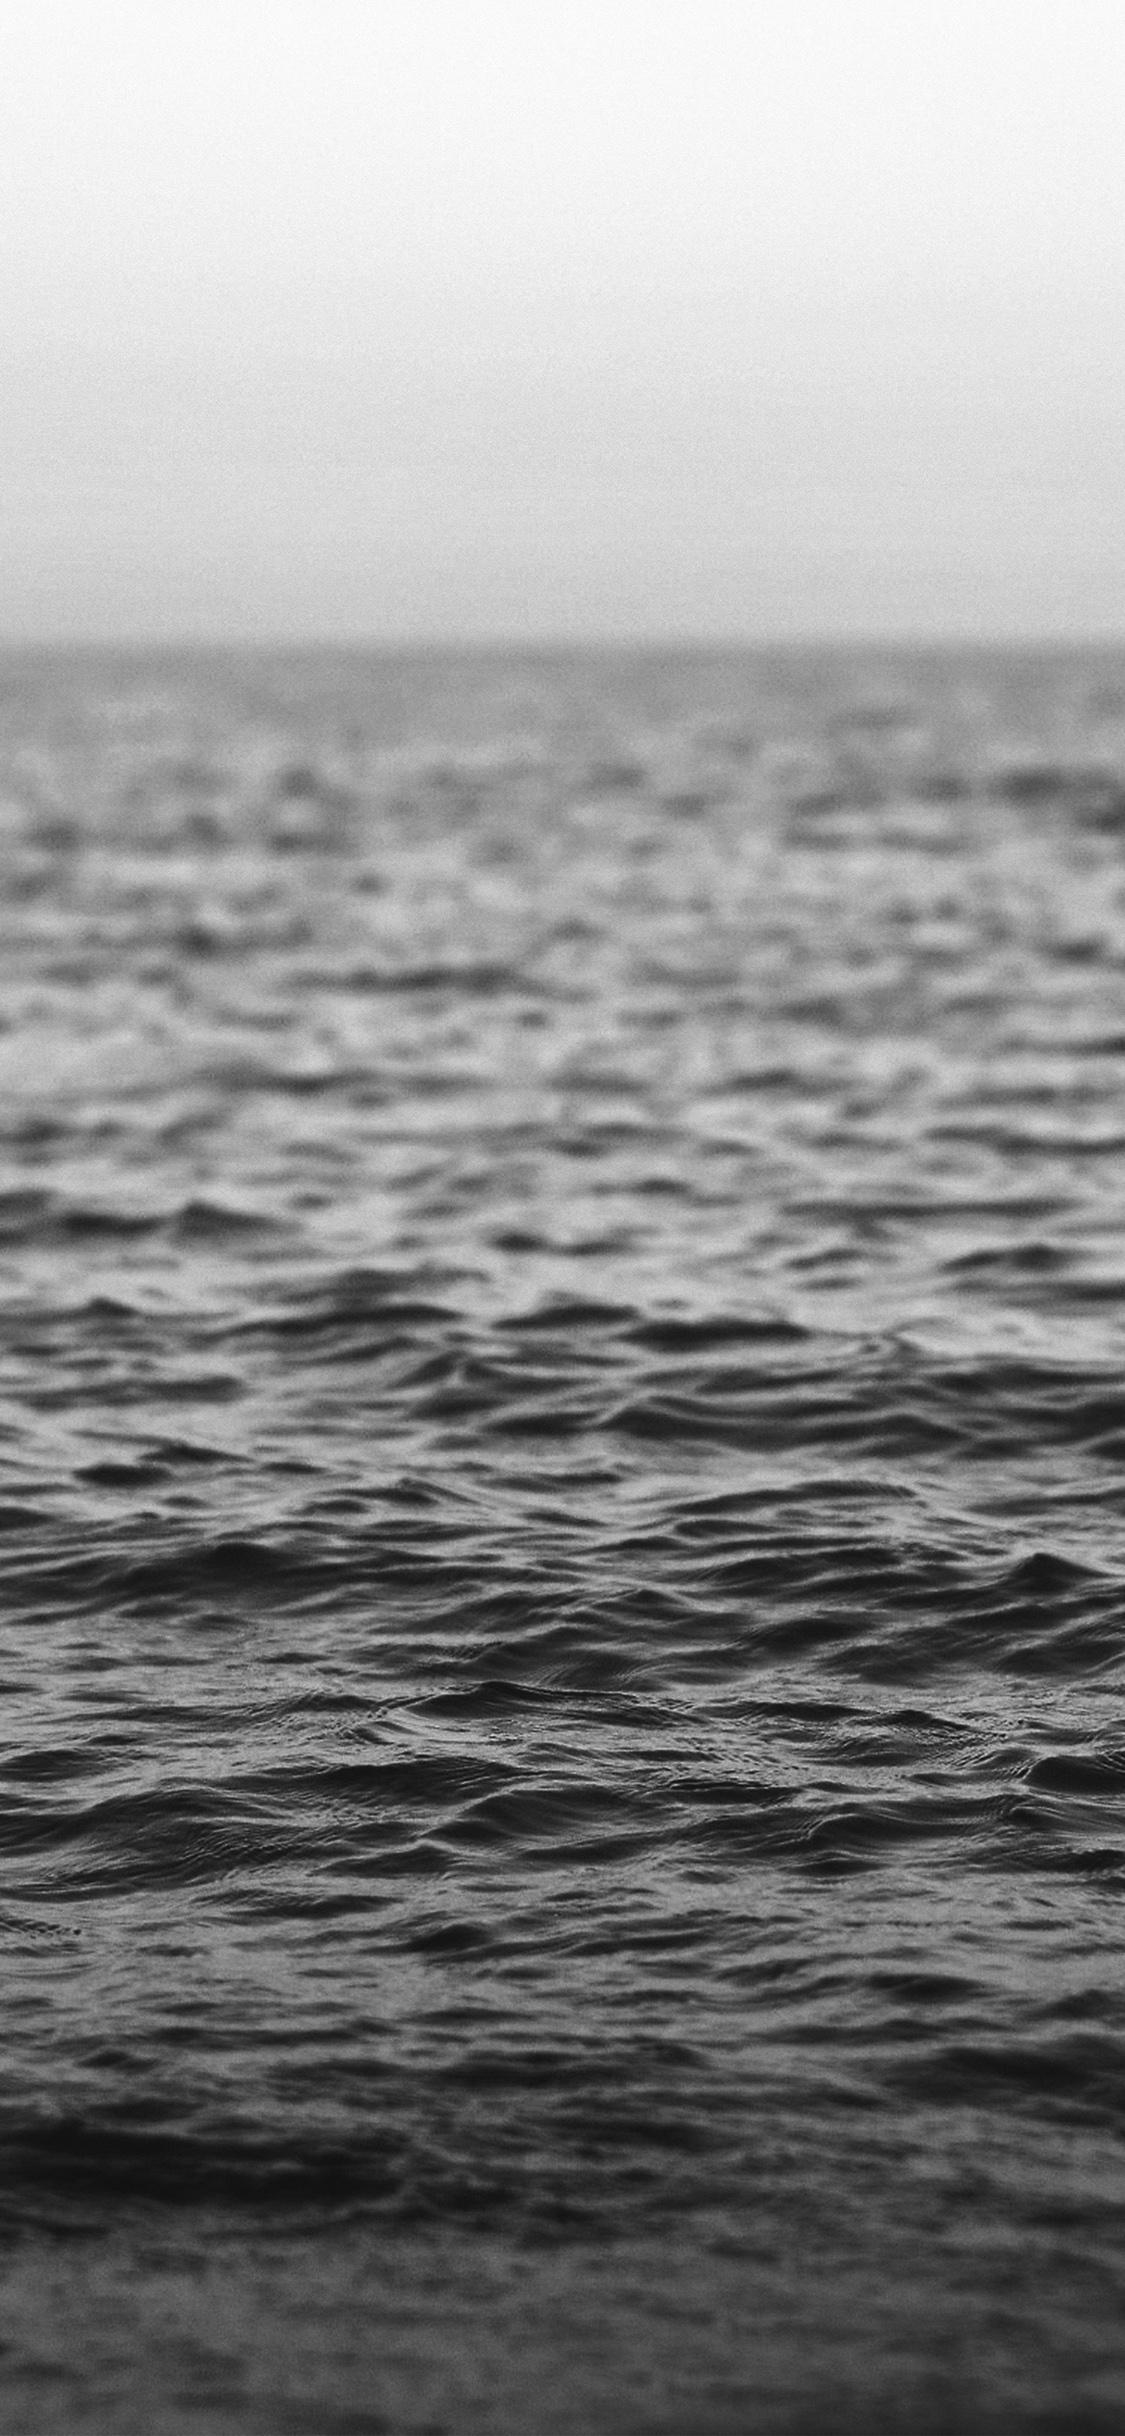 iPhonexpapers.com-Apple-iPhone-wallpaper-nj36-water-sea-ocean-wave-bokeh-dark-bw